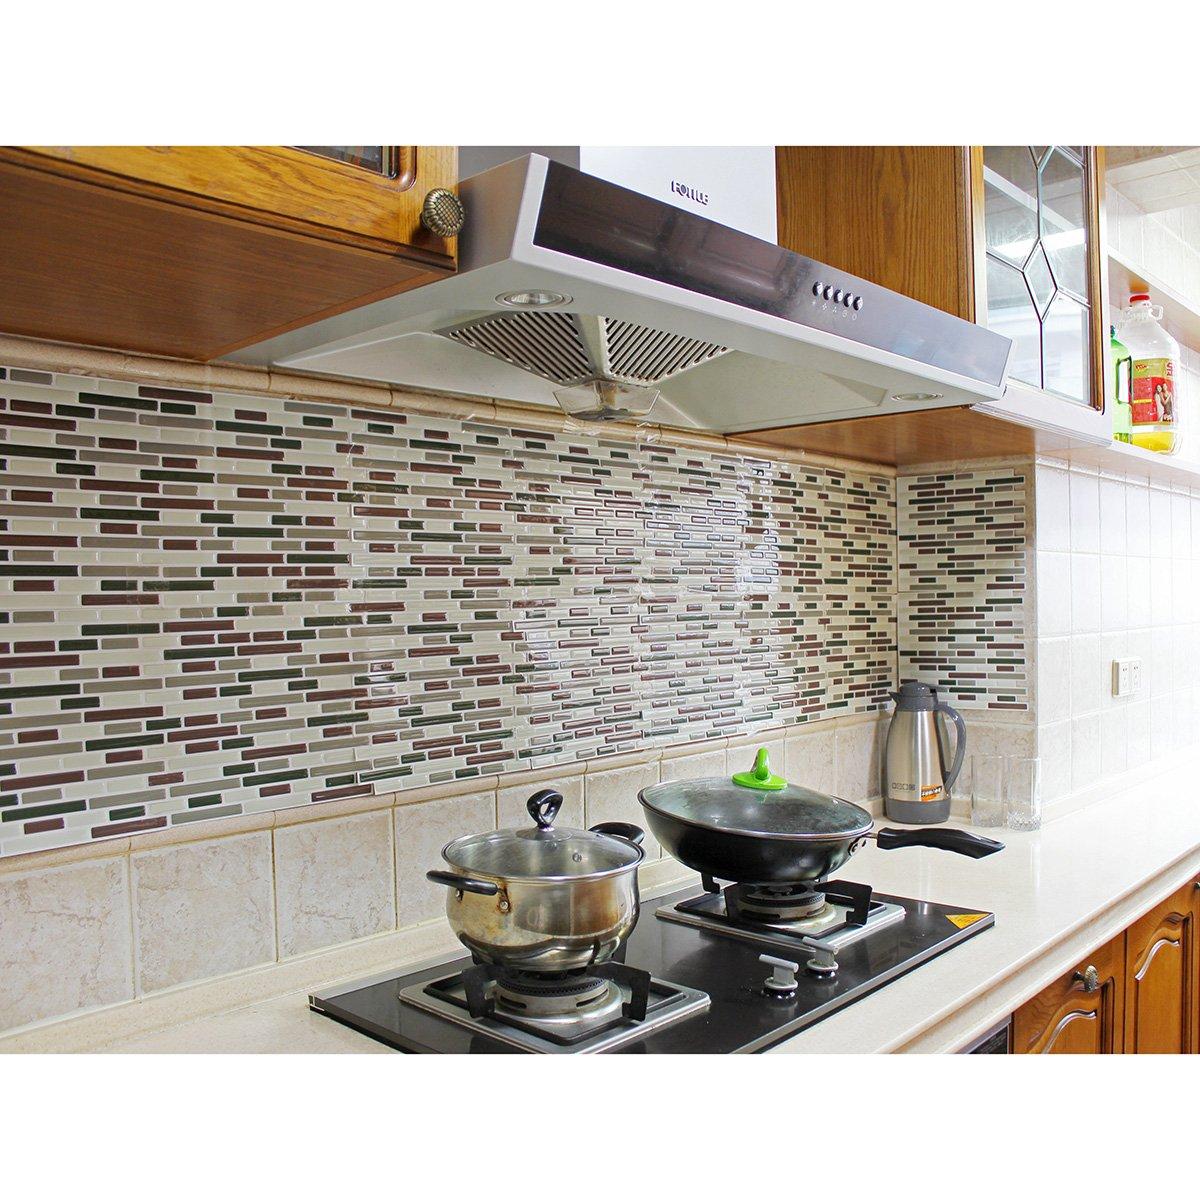 Kitchen Tile Decals Stickers Amazoncom Fancy Fix Vinyl Peel And Stick Decorative Kitchen